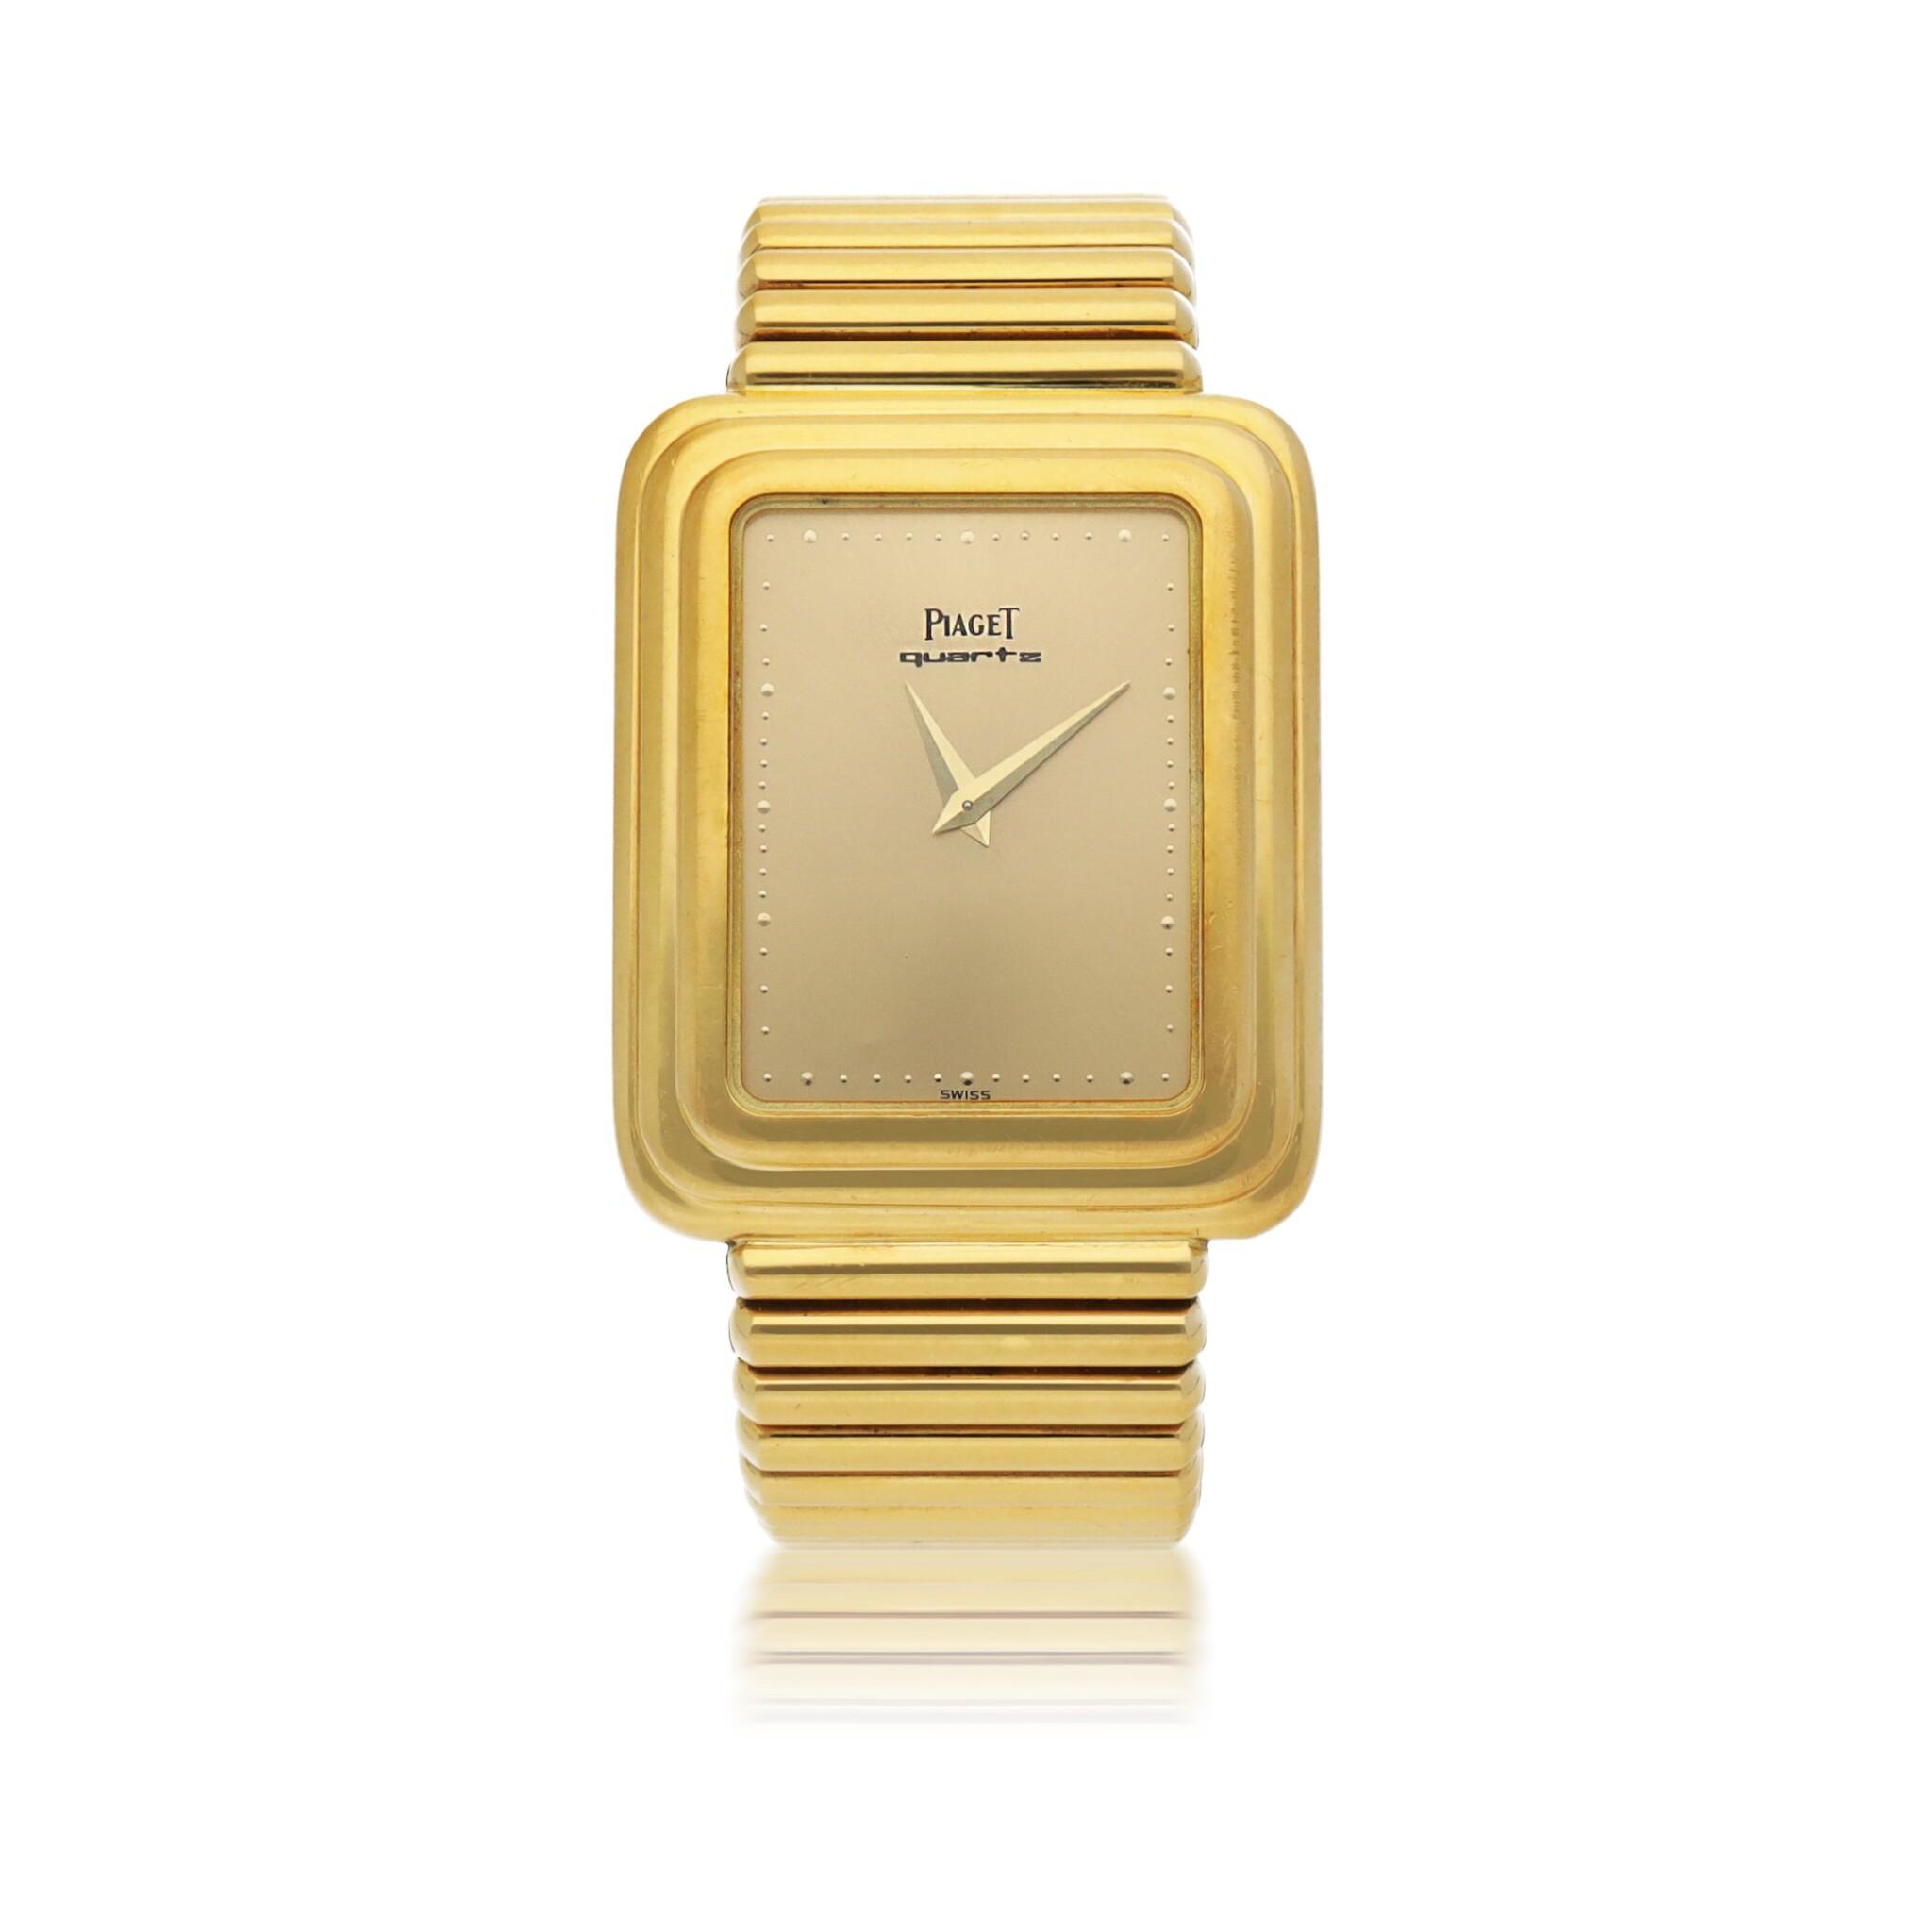 PIAGET | REF 74121 YELLOW GOLD BRACELET WATCH CIRCA 1980